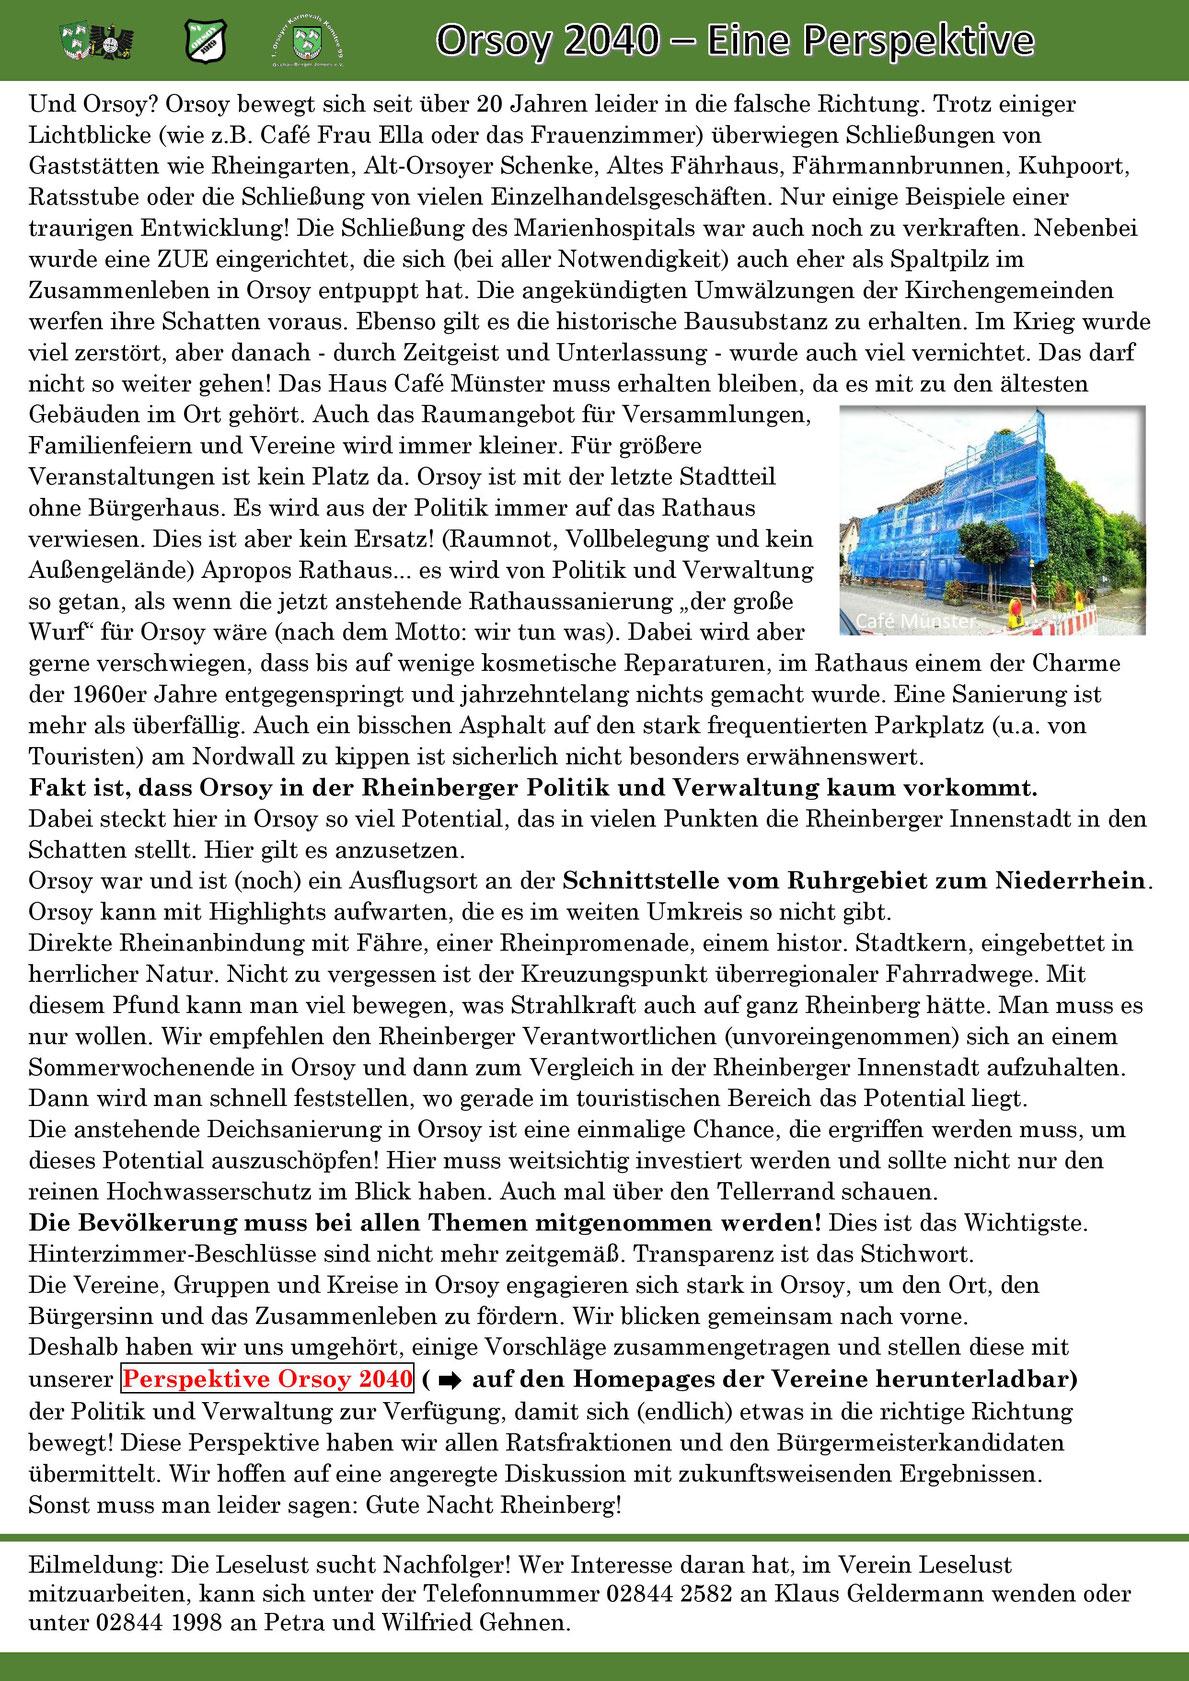 BSV-Orsoy, Orsoy, Bürgerschützenverein, Schützenblatt